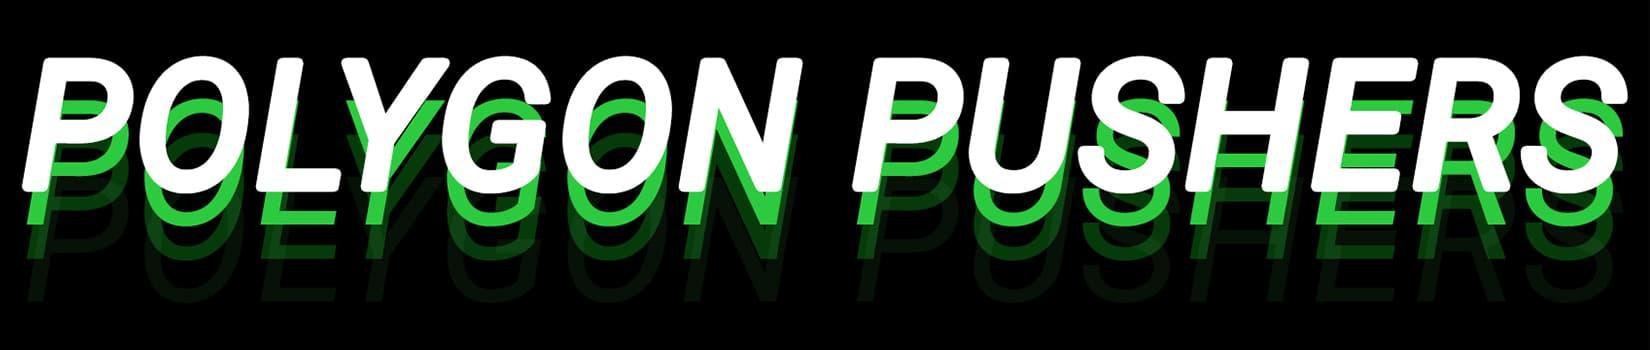 PolygonPushers